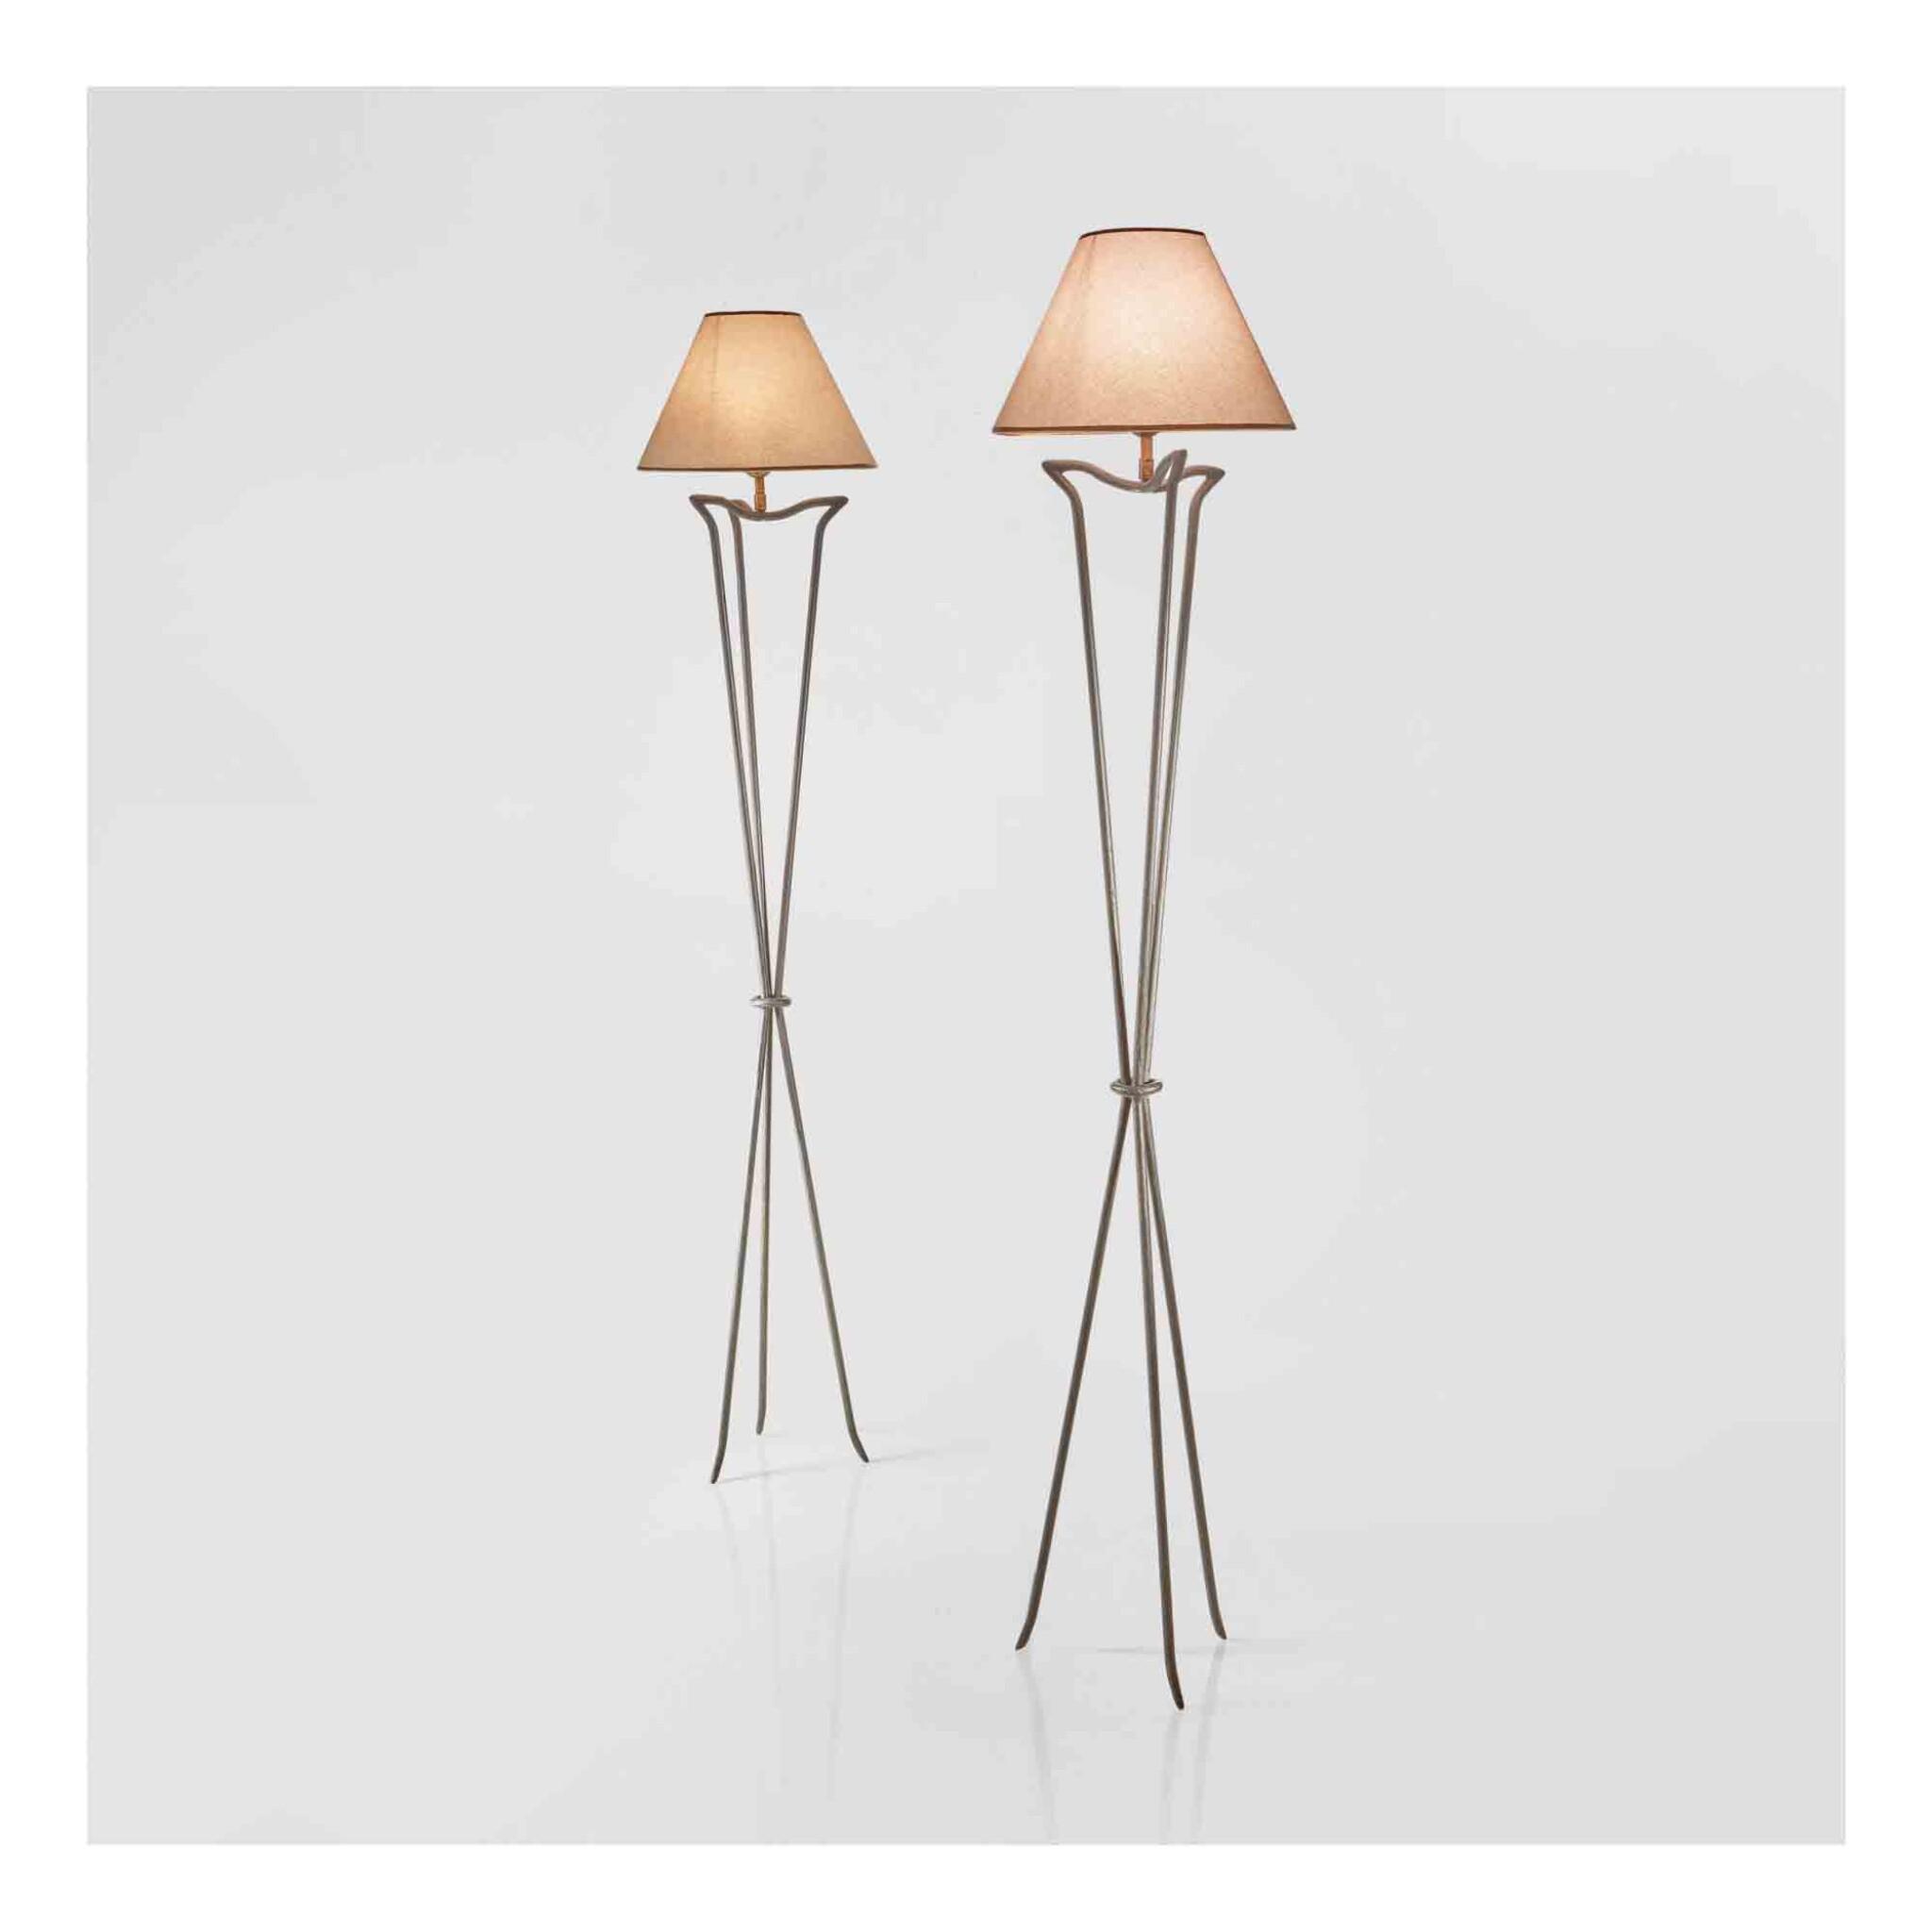 View 1 of Lot 349. Pair of Floor Lamps.